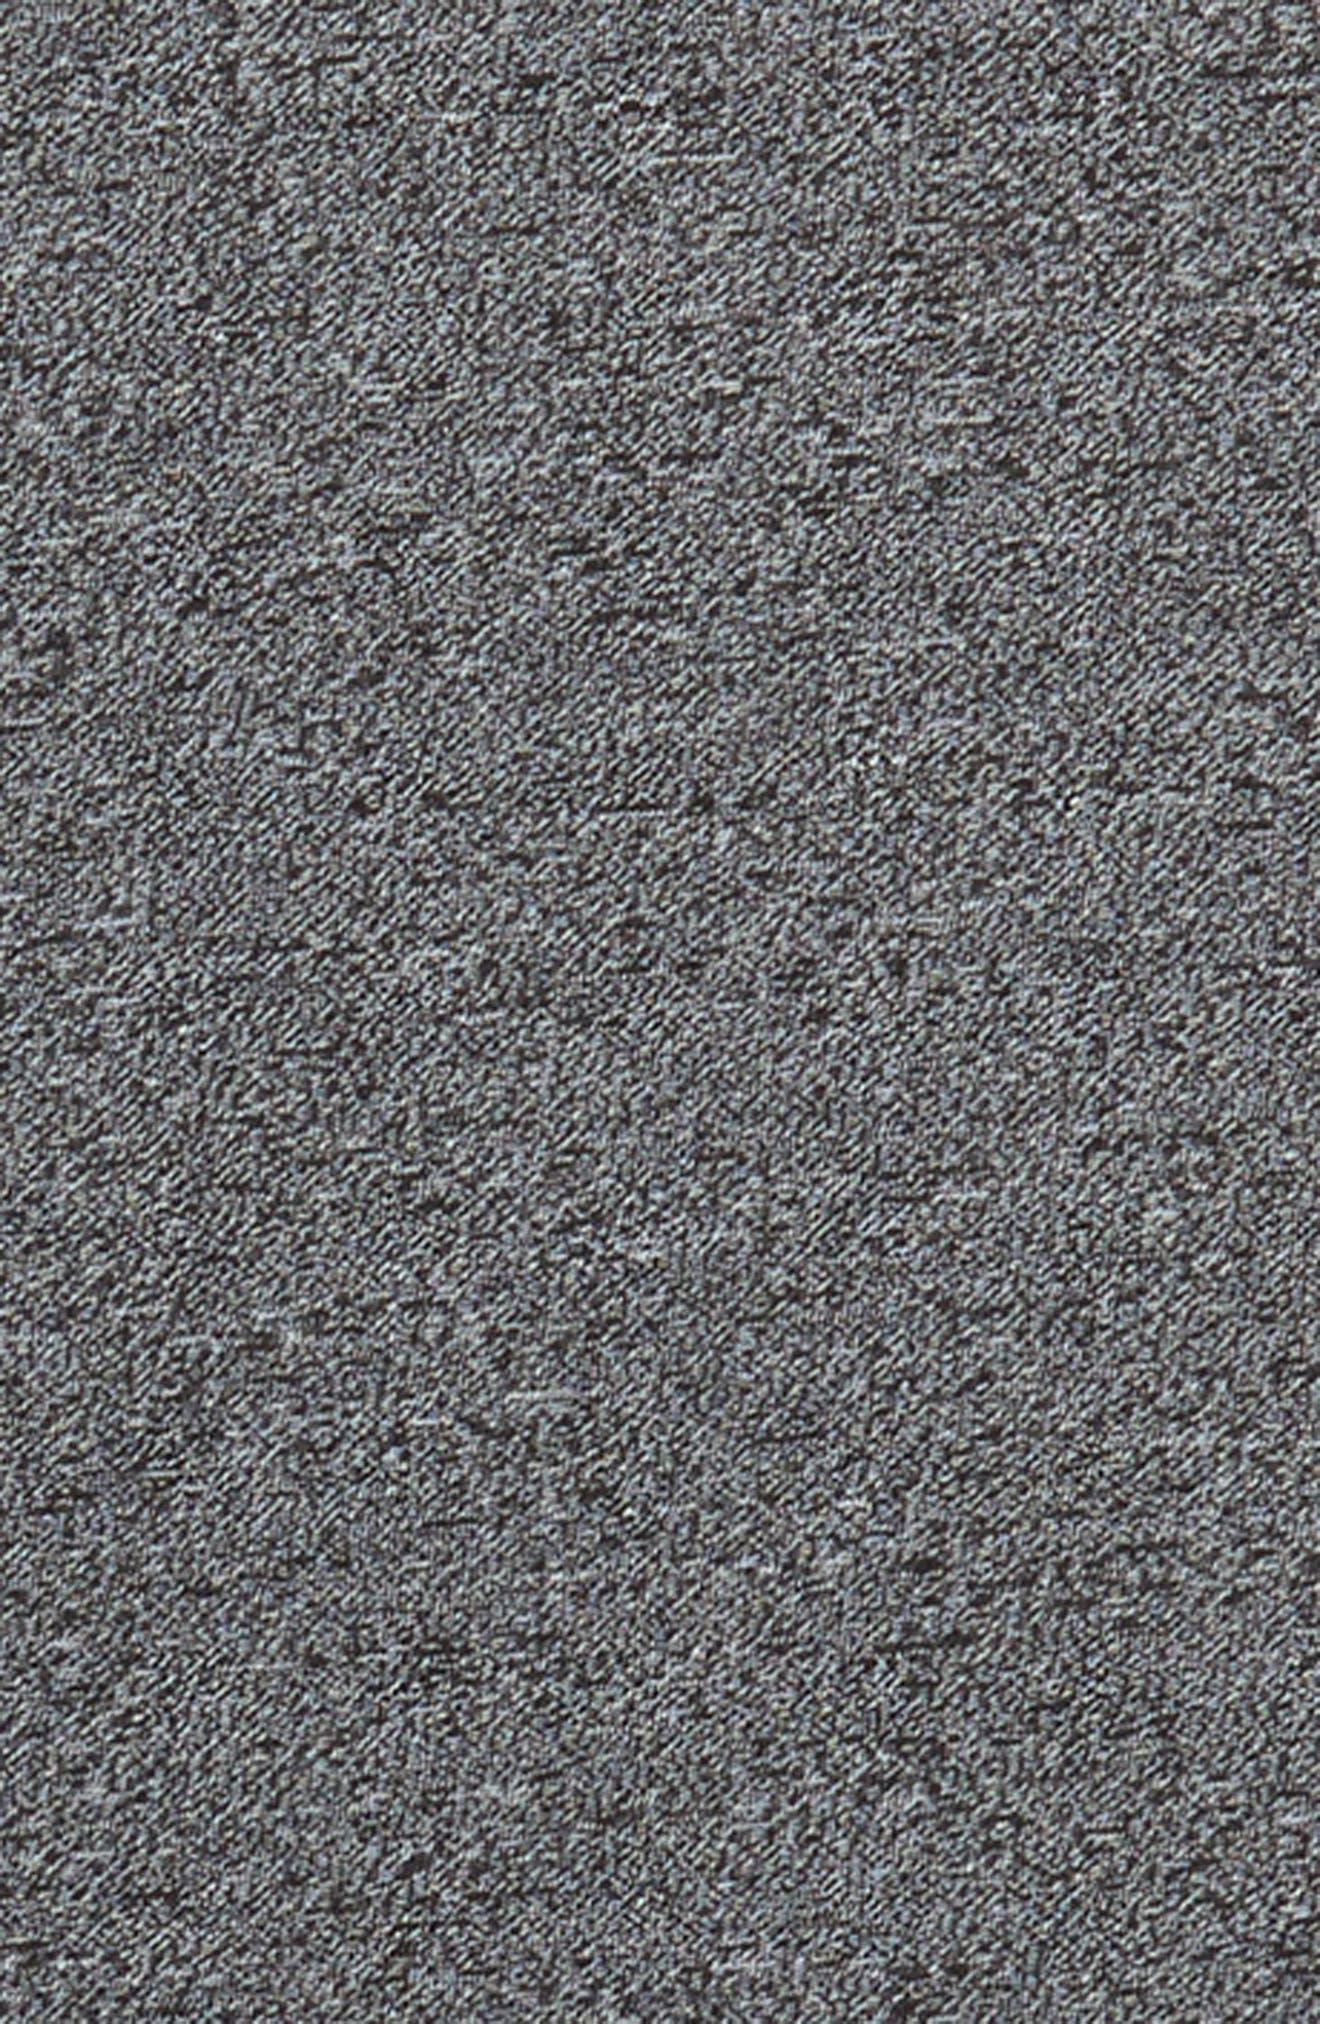 Garage Club T-Shirt,                             Alternate thumbnail 2, color,                             Black Heather